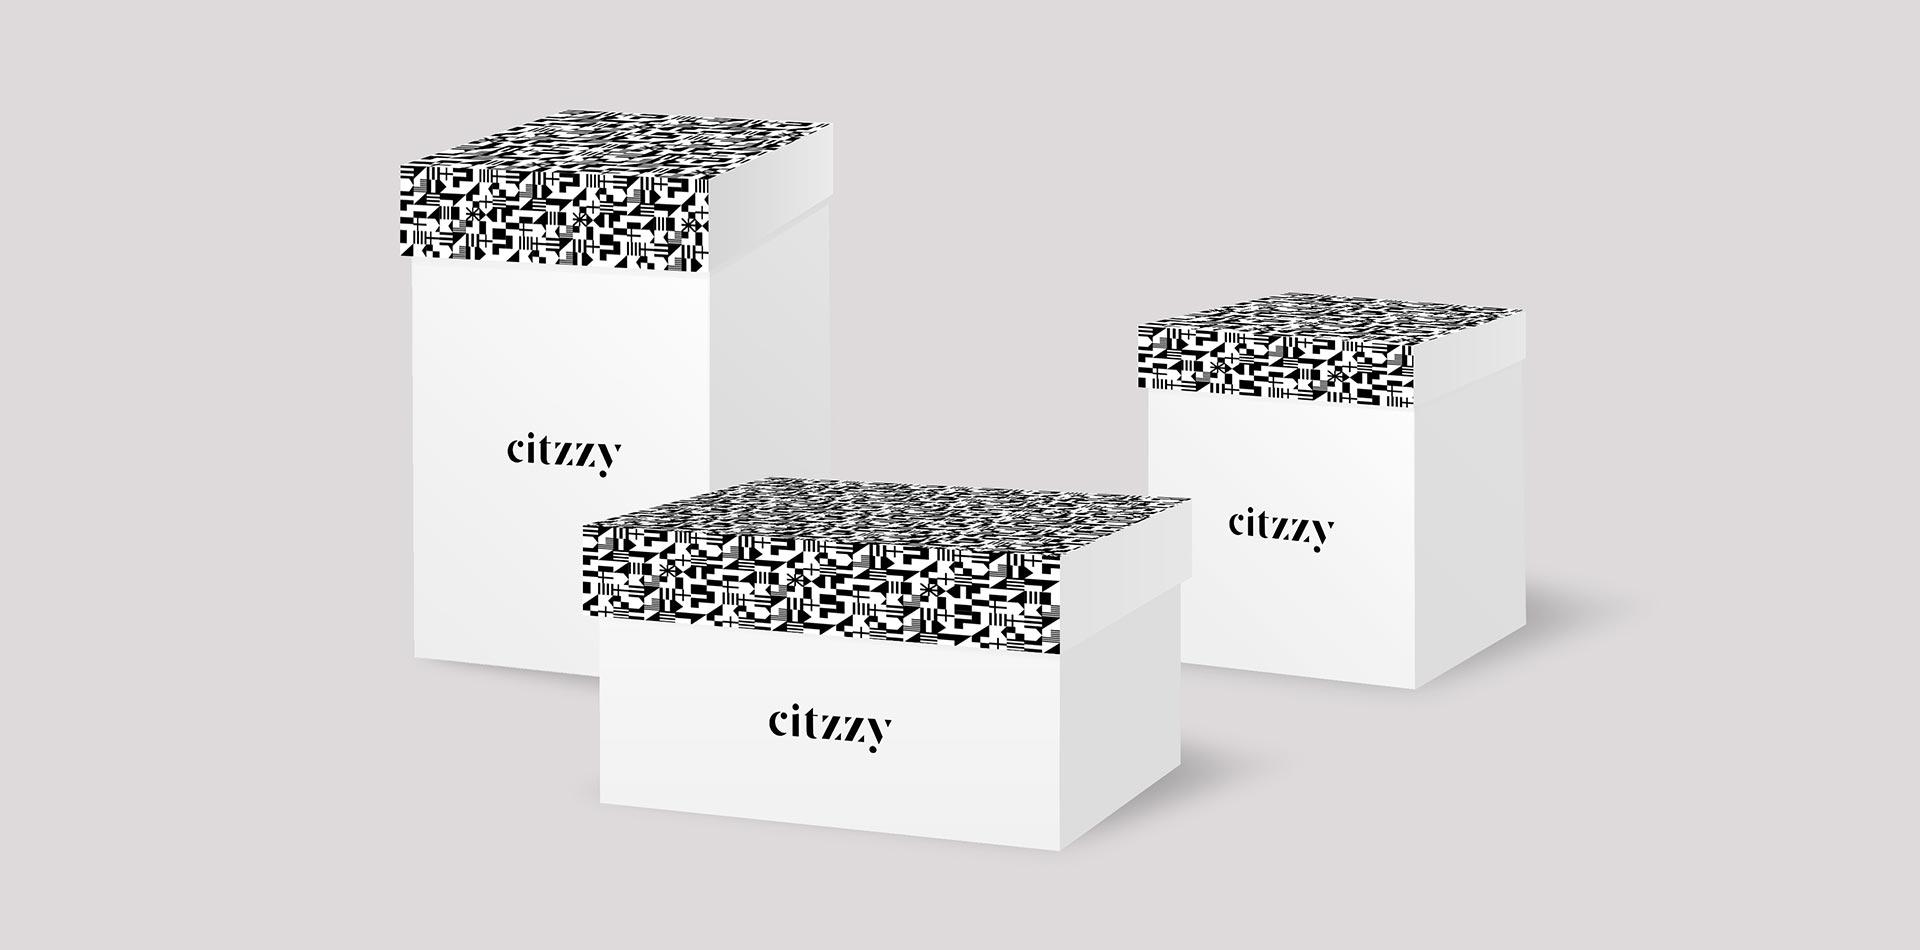 Citzzy by Barceló estudio - Creative Work - $i